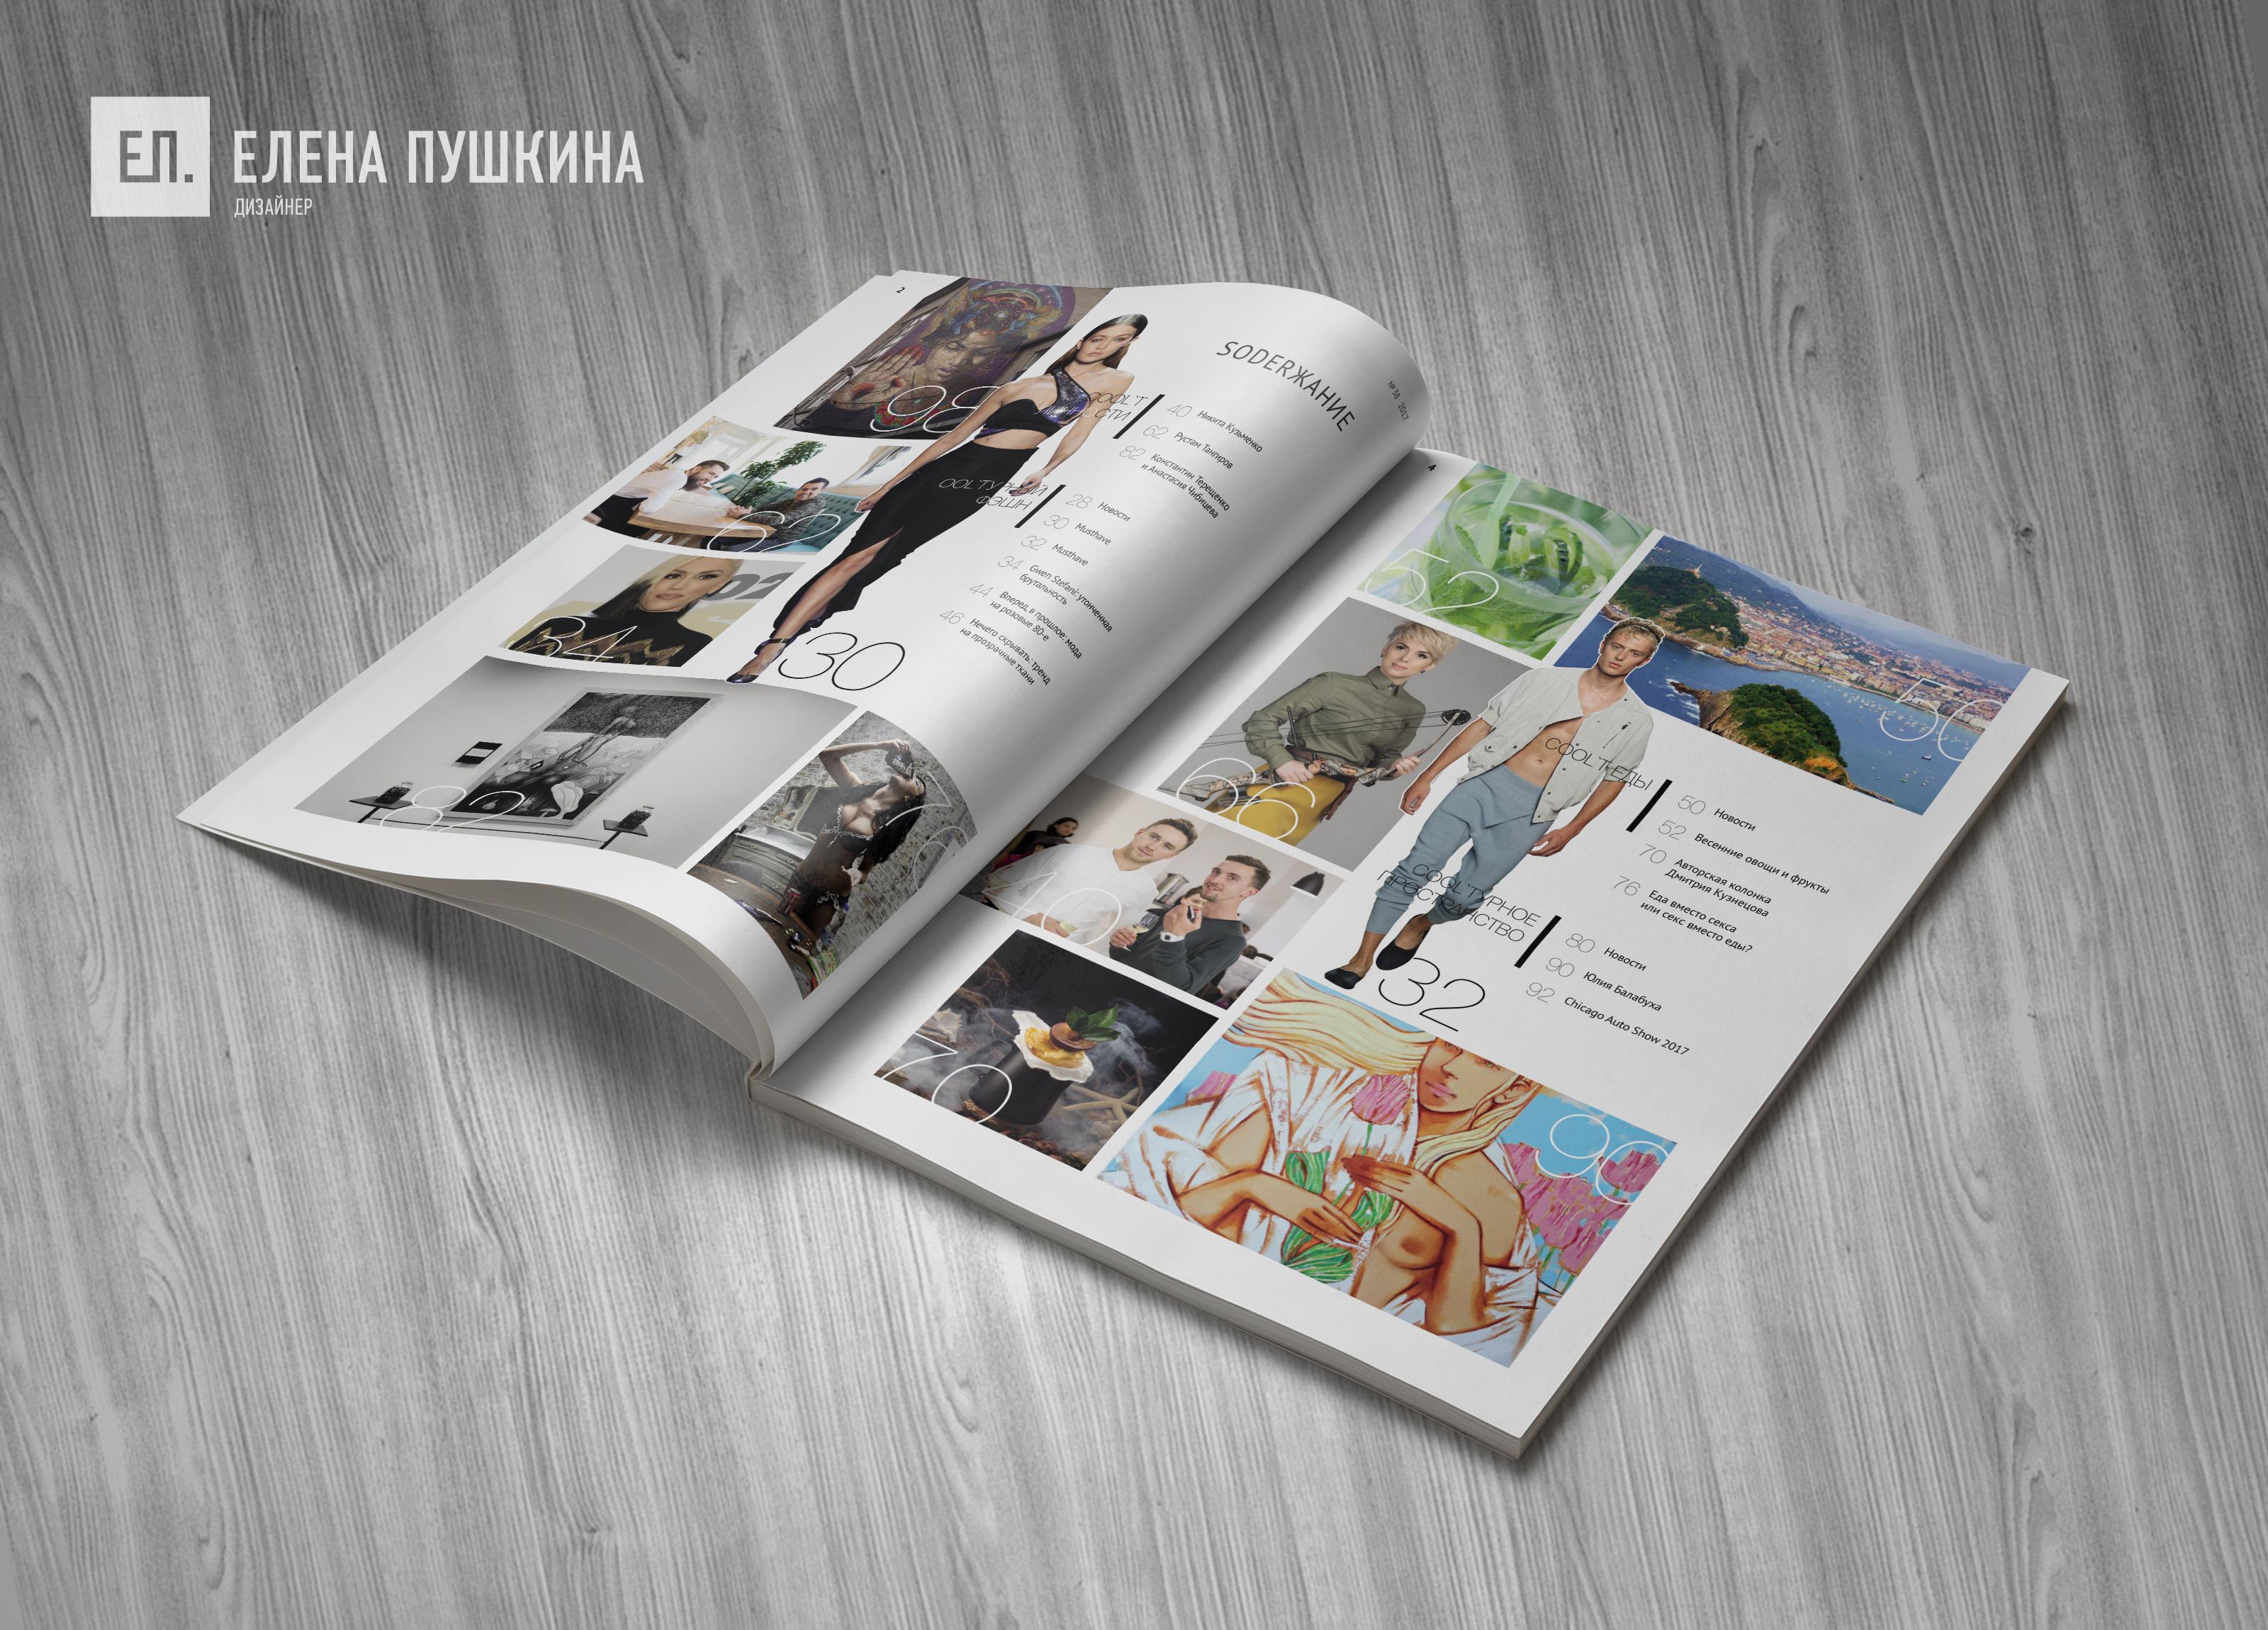 Глянцевый журнал «CoolBaba» №38 весна 2017— разработка дизайна ивёрстка журнала Разработка журналов Портфолио